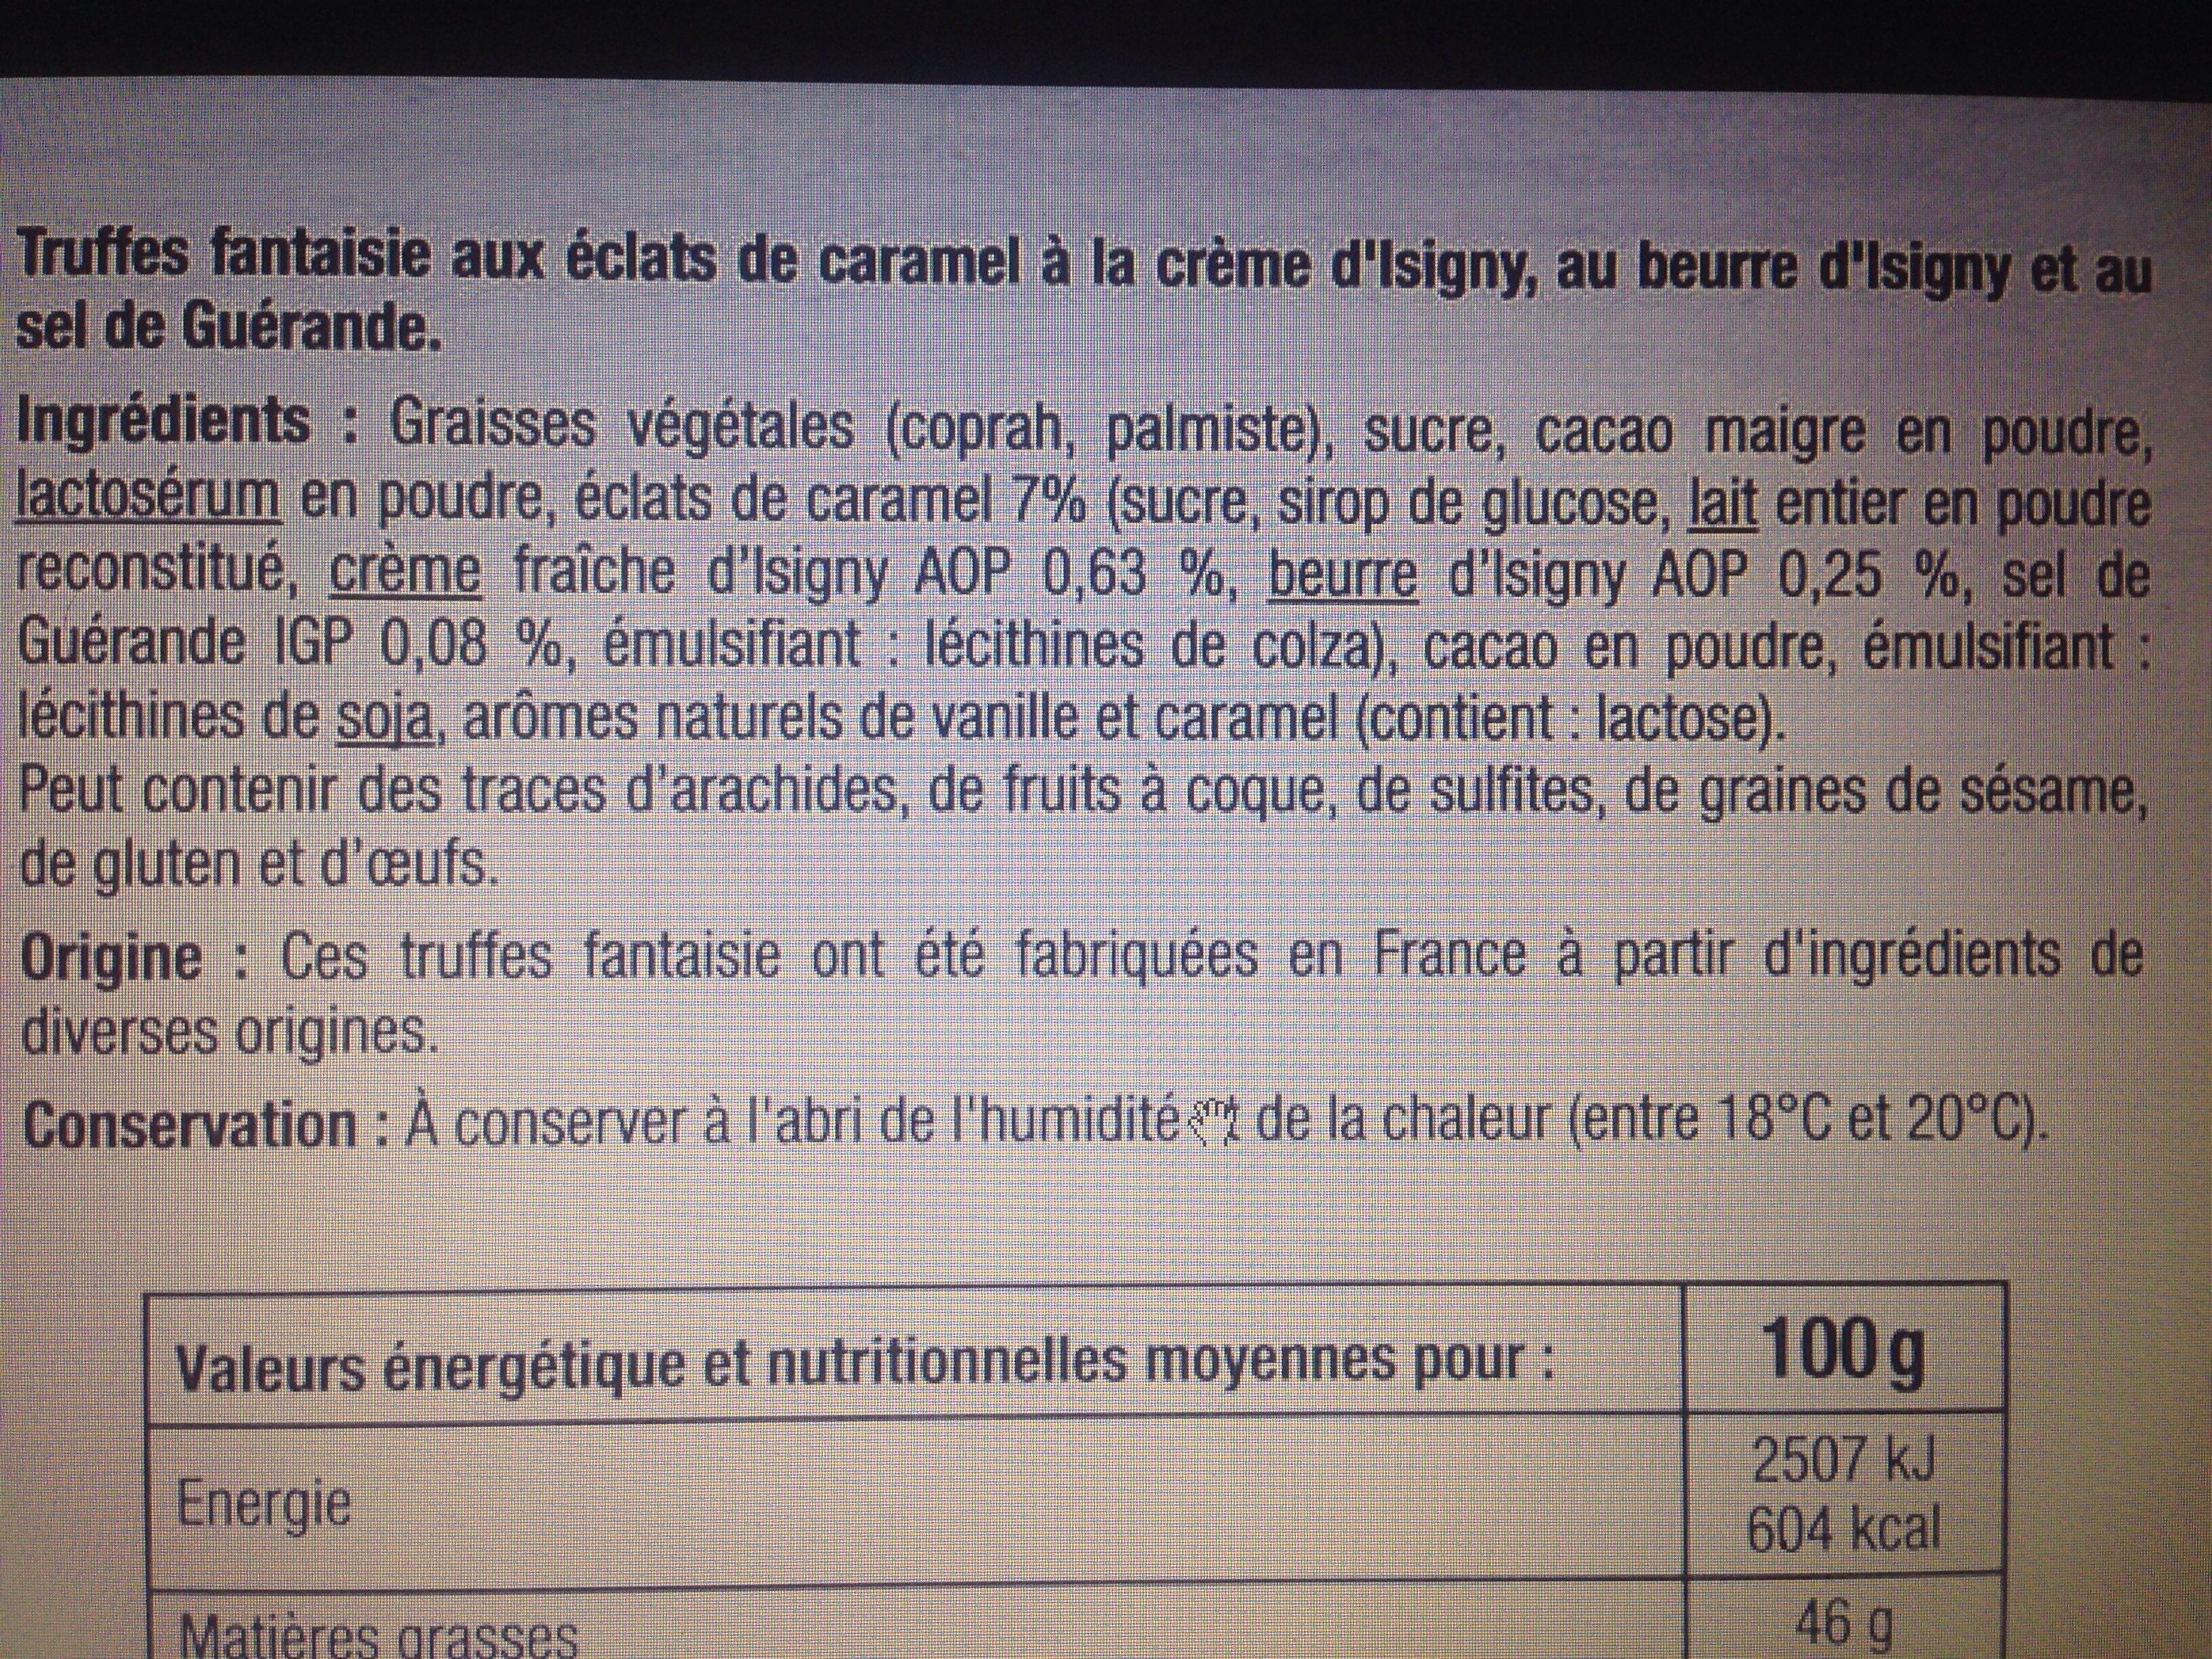 Truffes fantaisie  saveur caramel - Ingredients